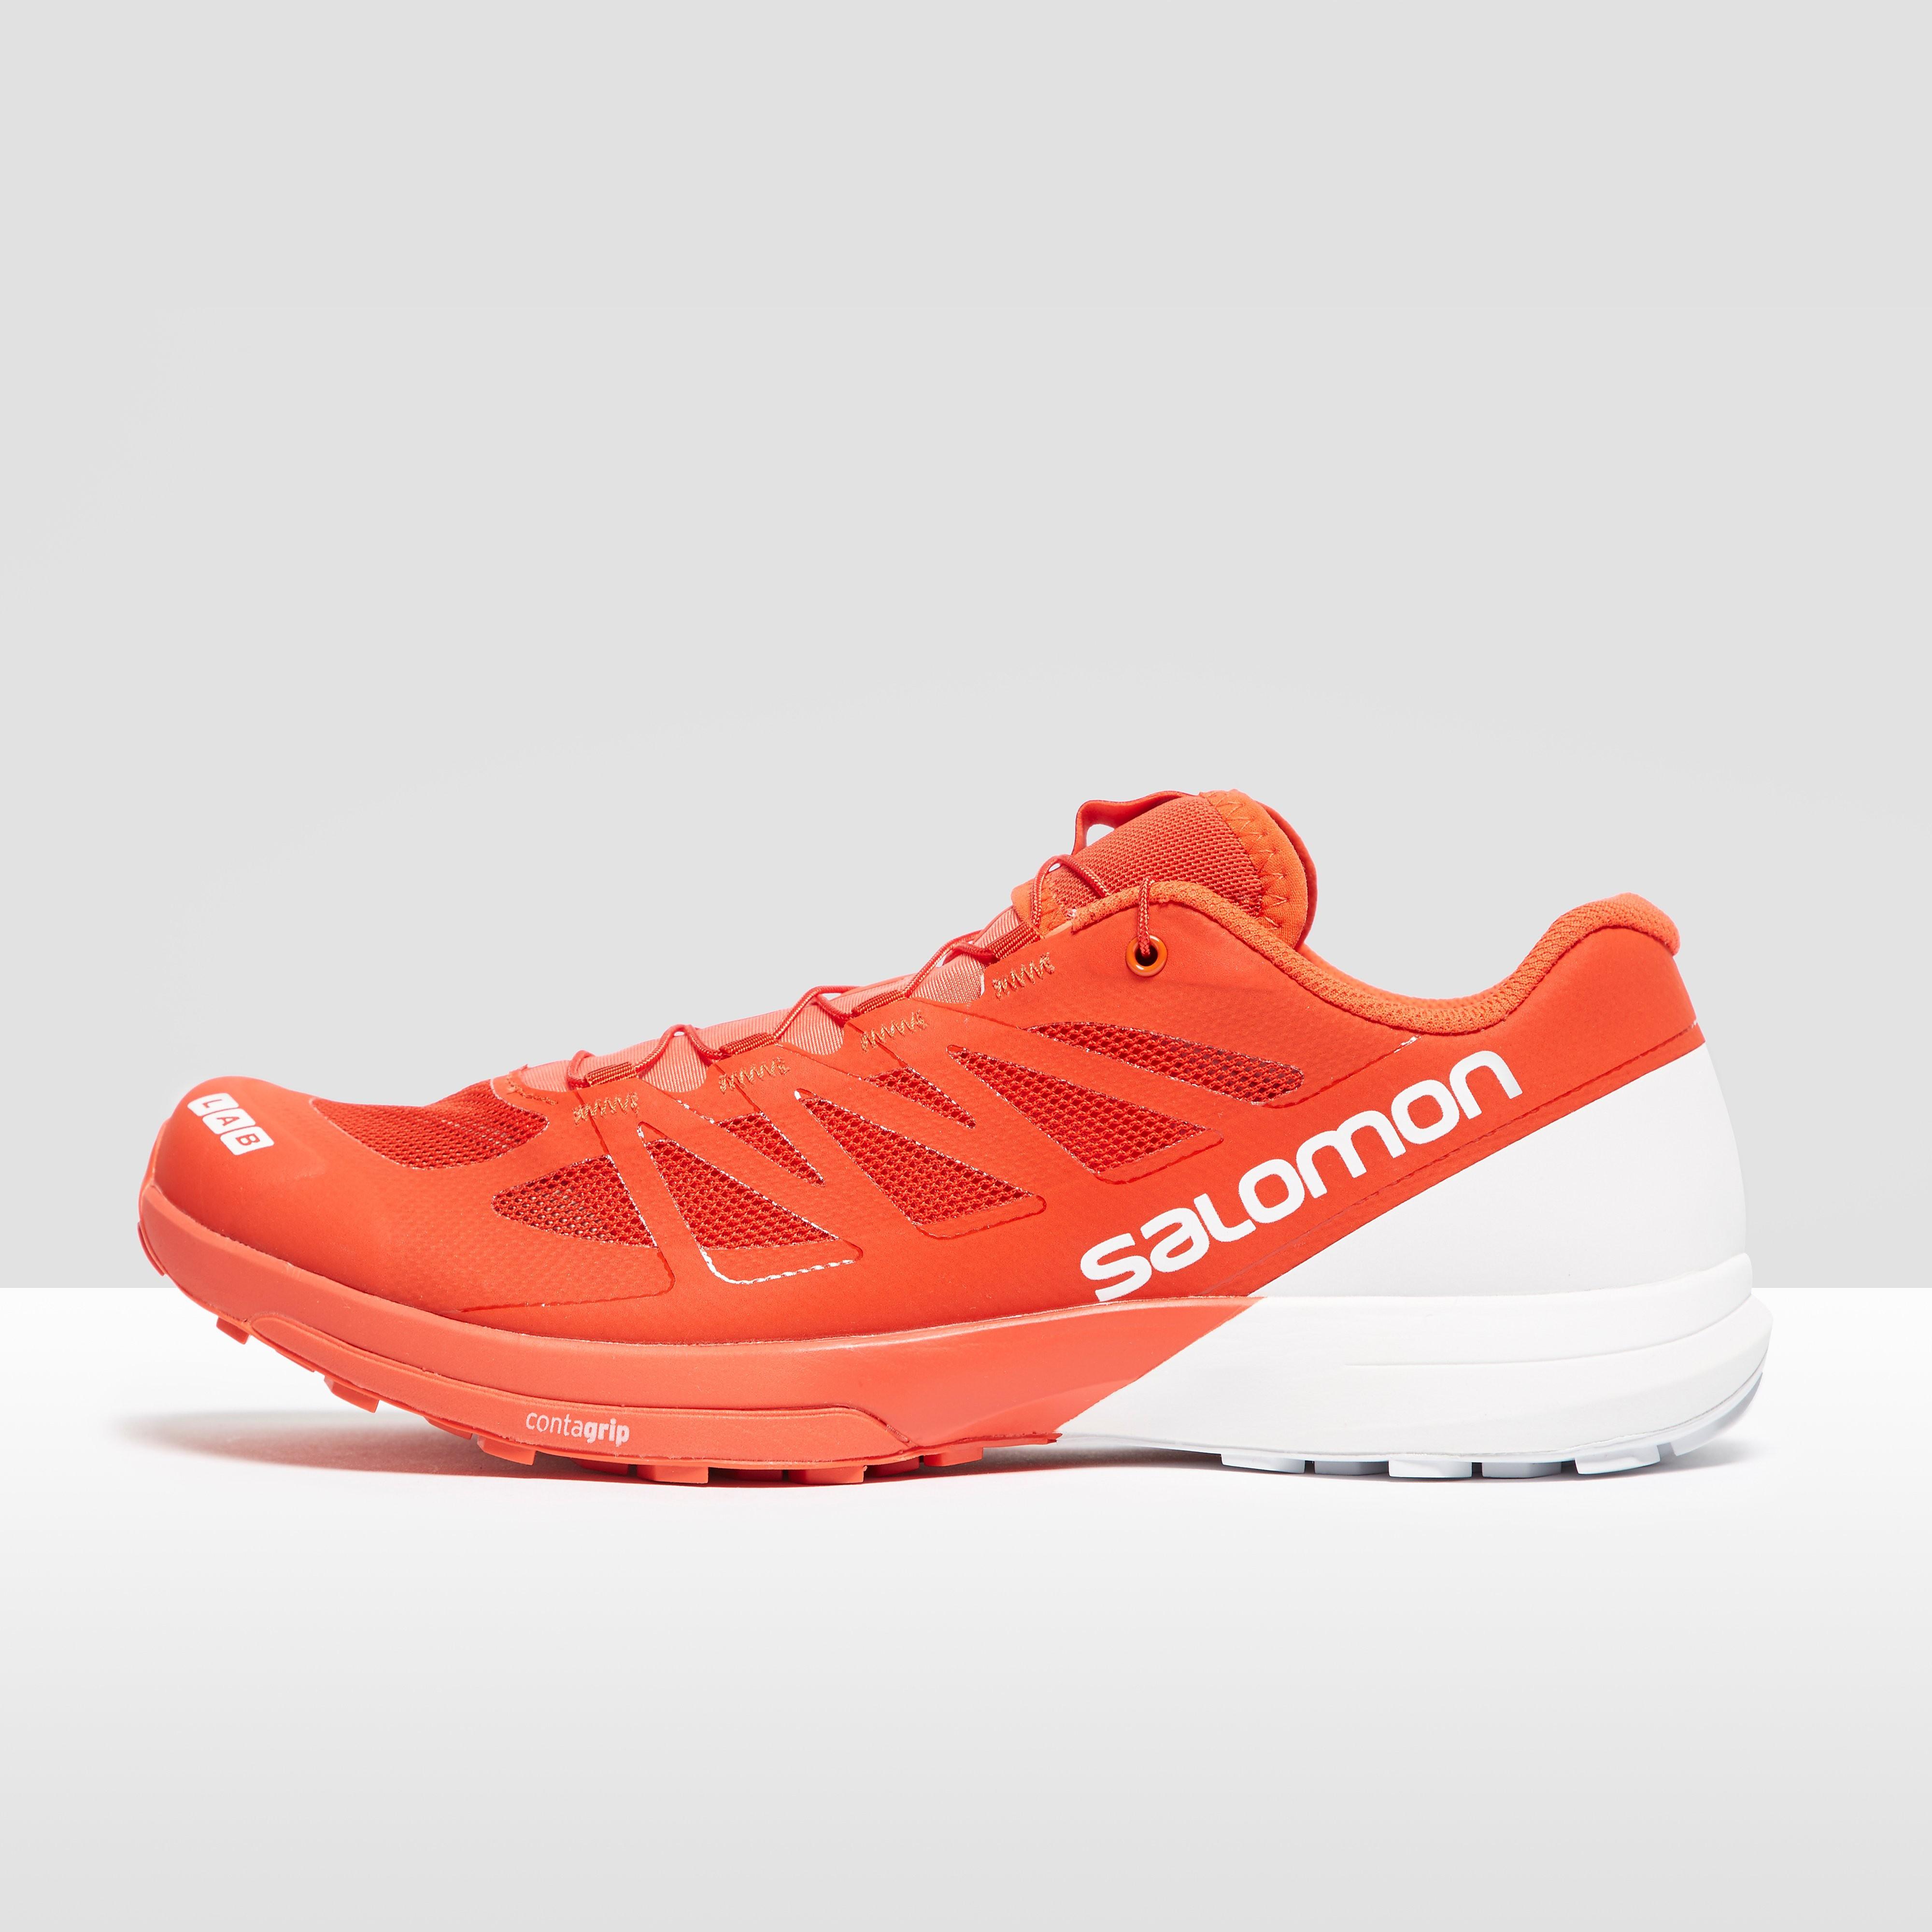 Salomon S-Lab Sense 6 Men's Trail Running Shoes